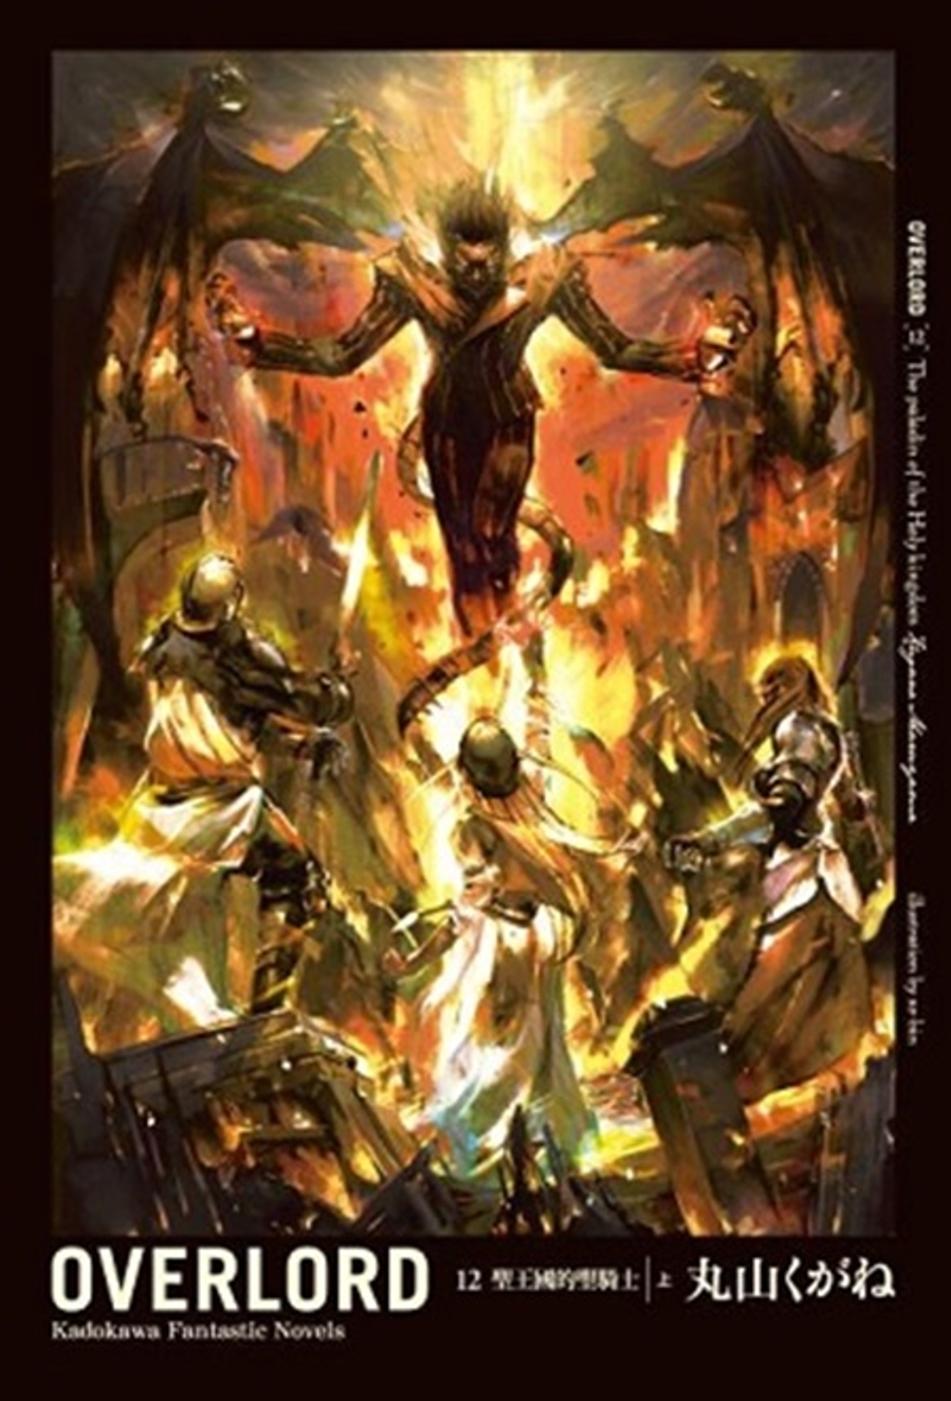 OVERLORD (12) 聖王國的聖騎士 上